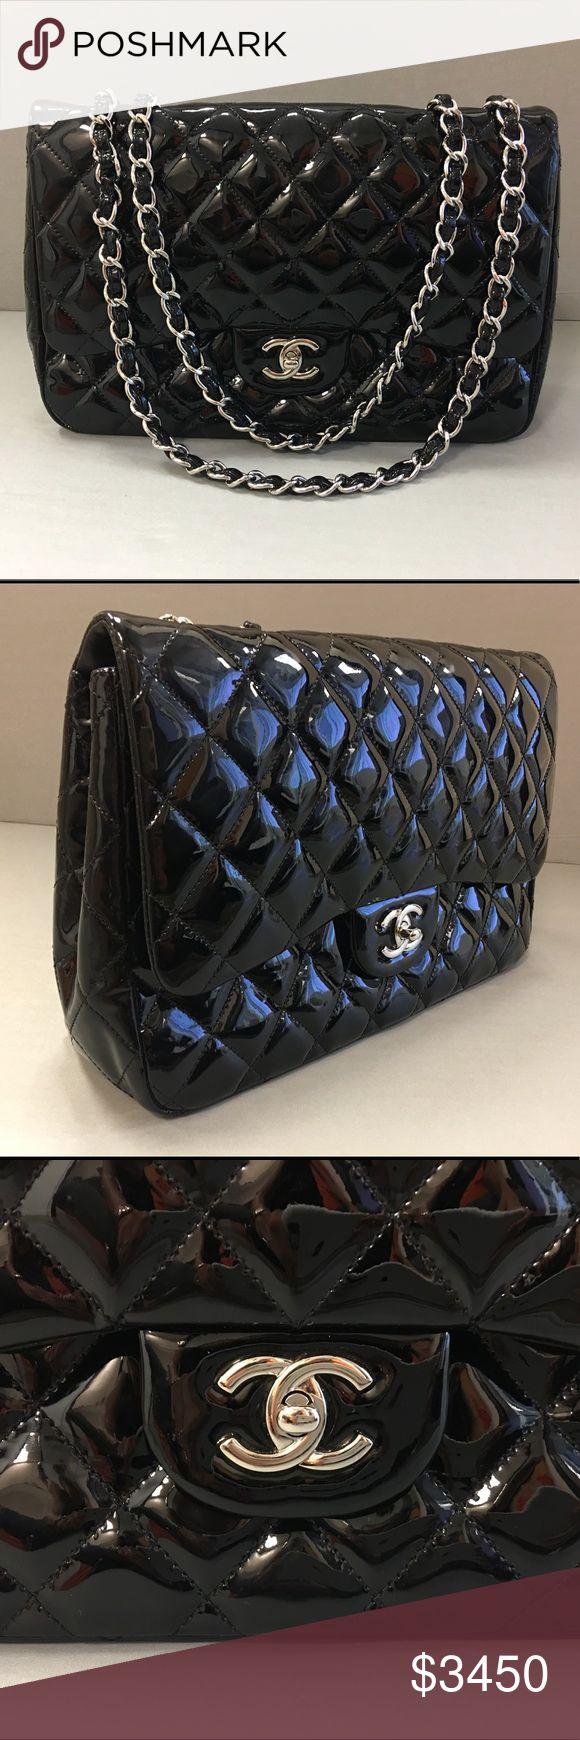 Chanel handbag superb vintage chanel bag vintage leather - Chanel Classic Jumbo Bag Black Patent Leather